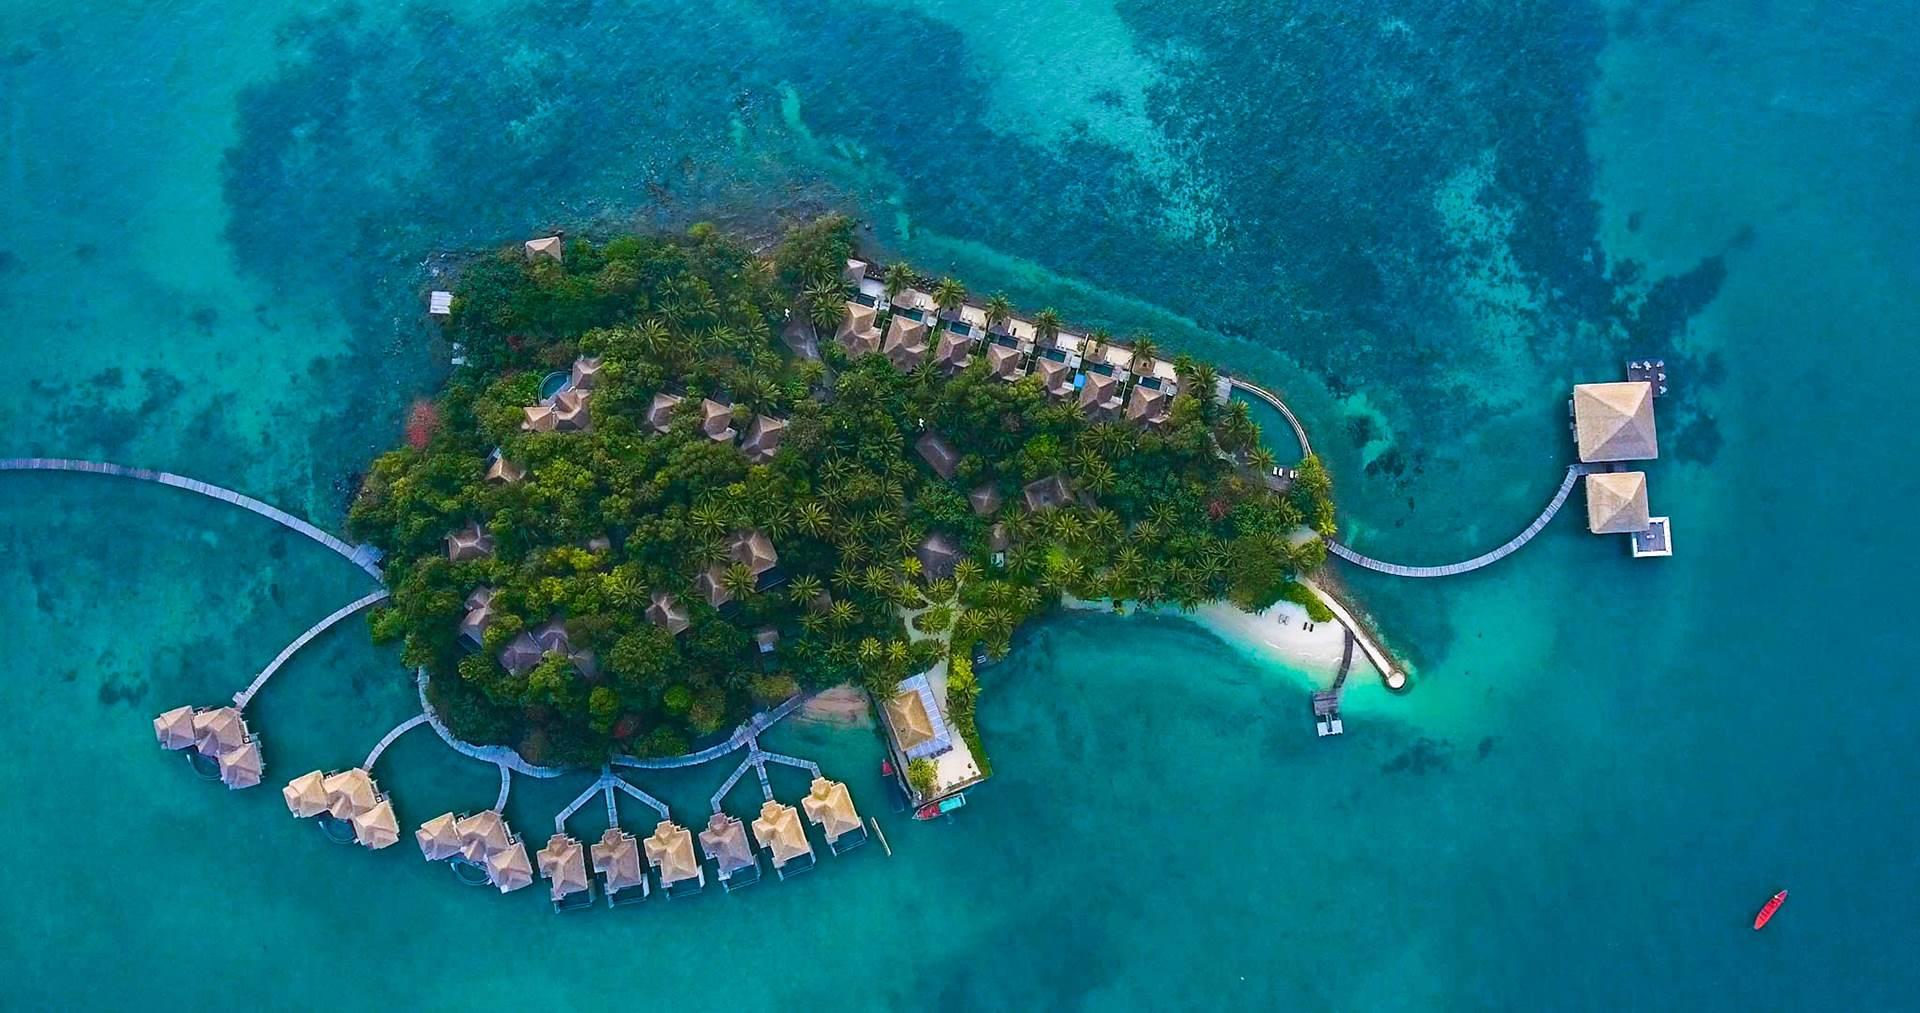 Song Saa Resort - Archipiélago de Koh Rong